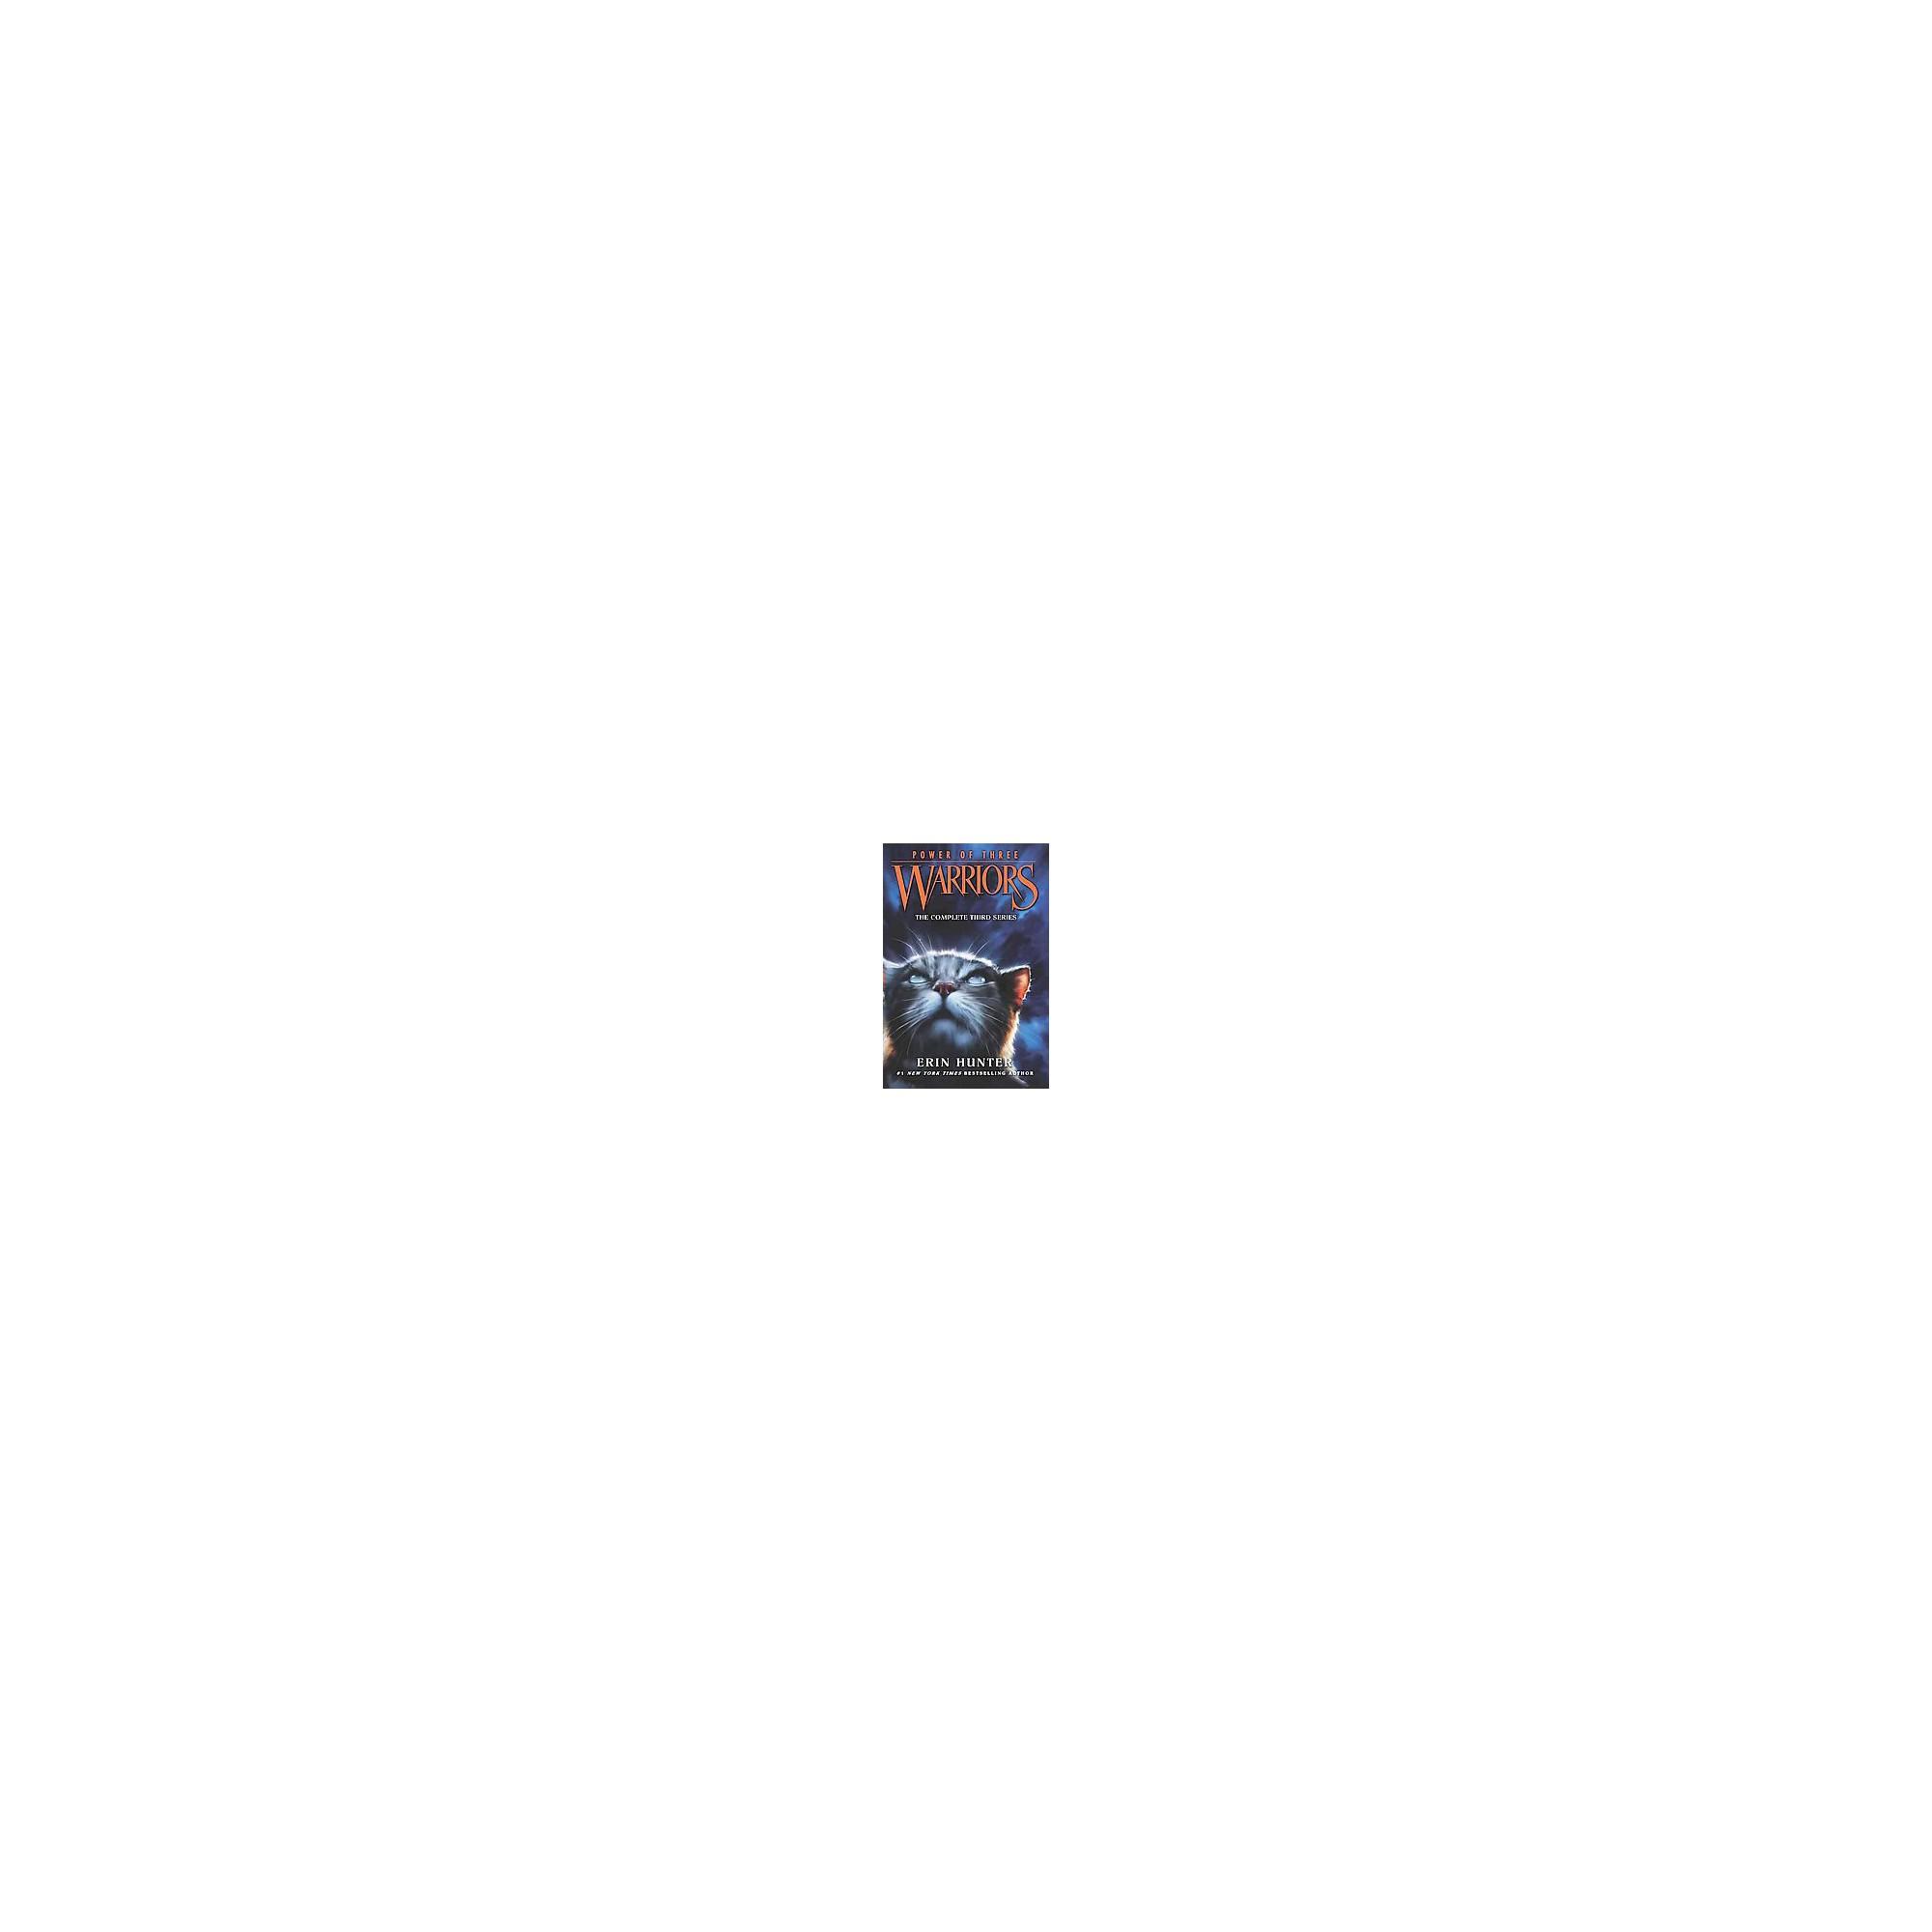 Warriors Power Of Three Box Set Volumes 1 To 6 By Erin Hunter